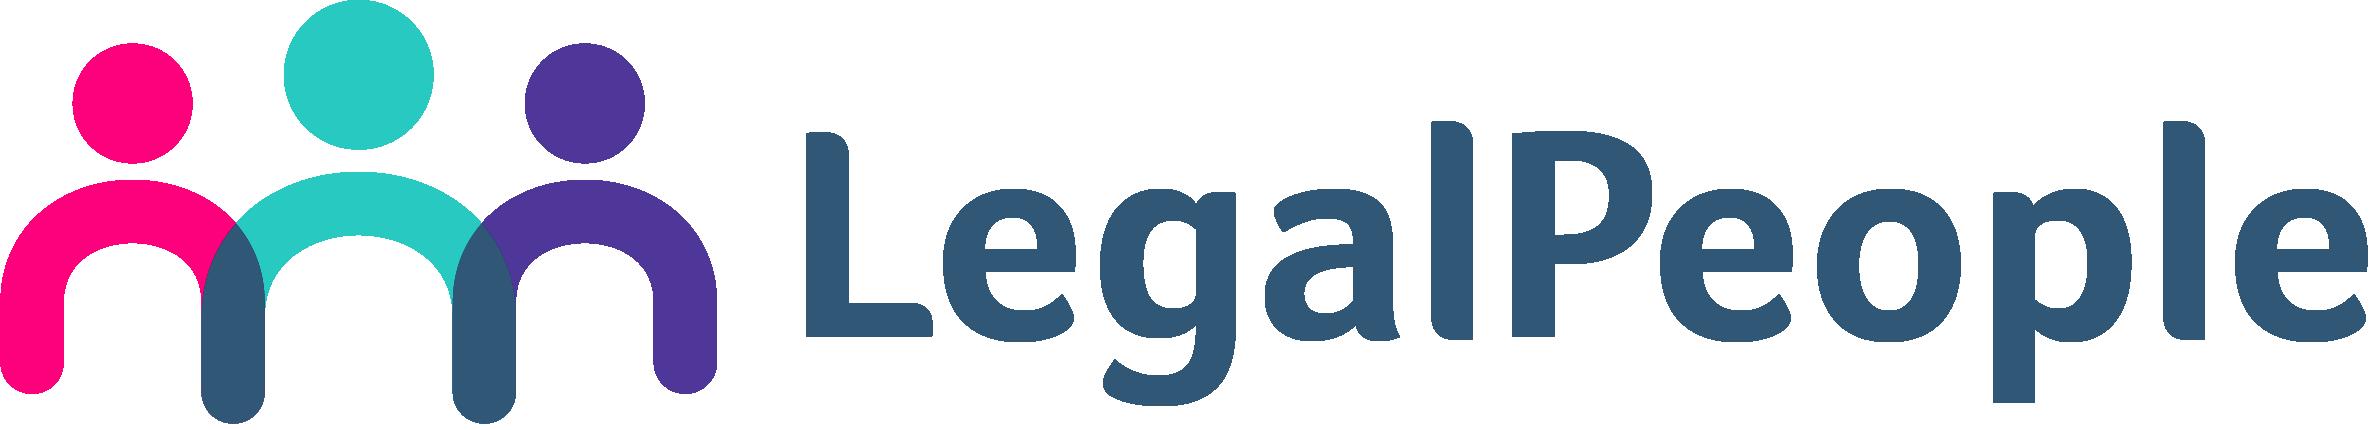 LegalPeople logo